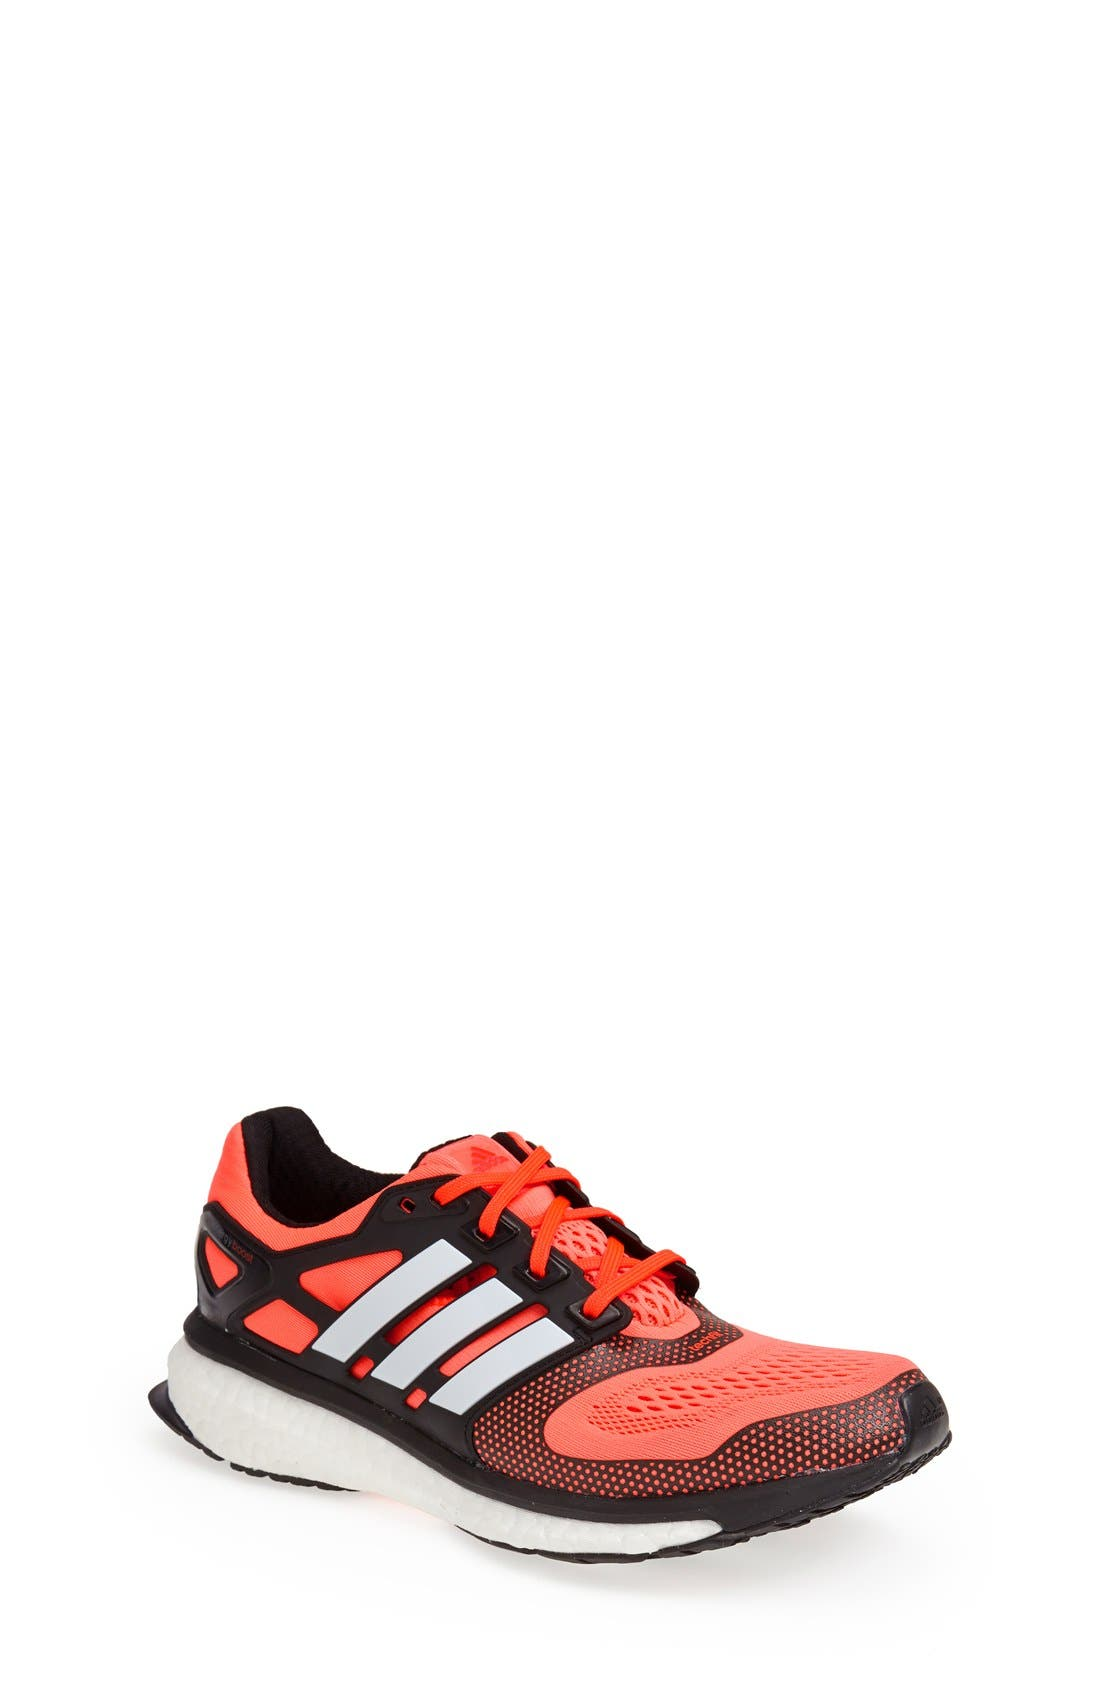 adidas Adistar Boost ESM Shoes Black 4.5: Amazon.co.uk